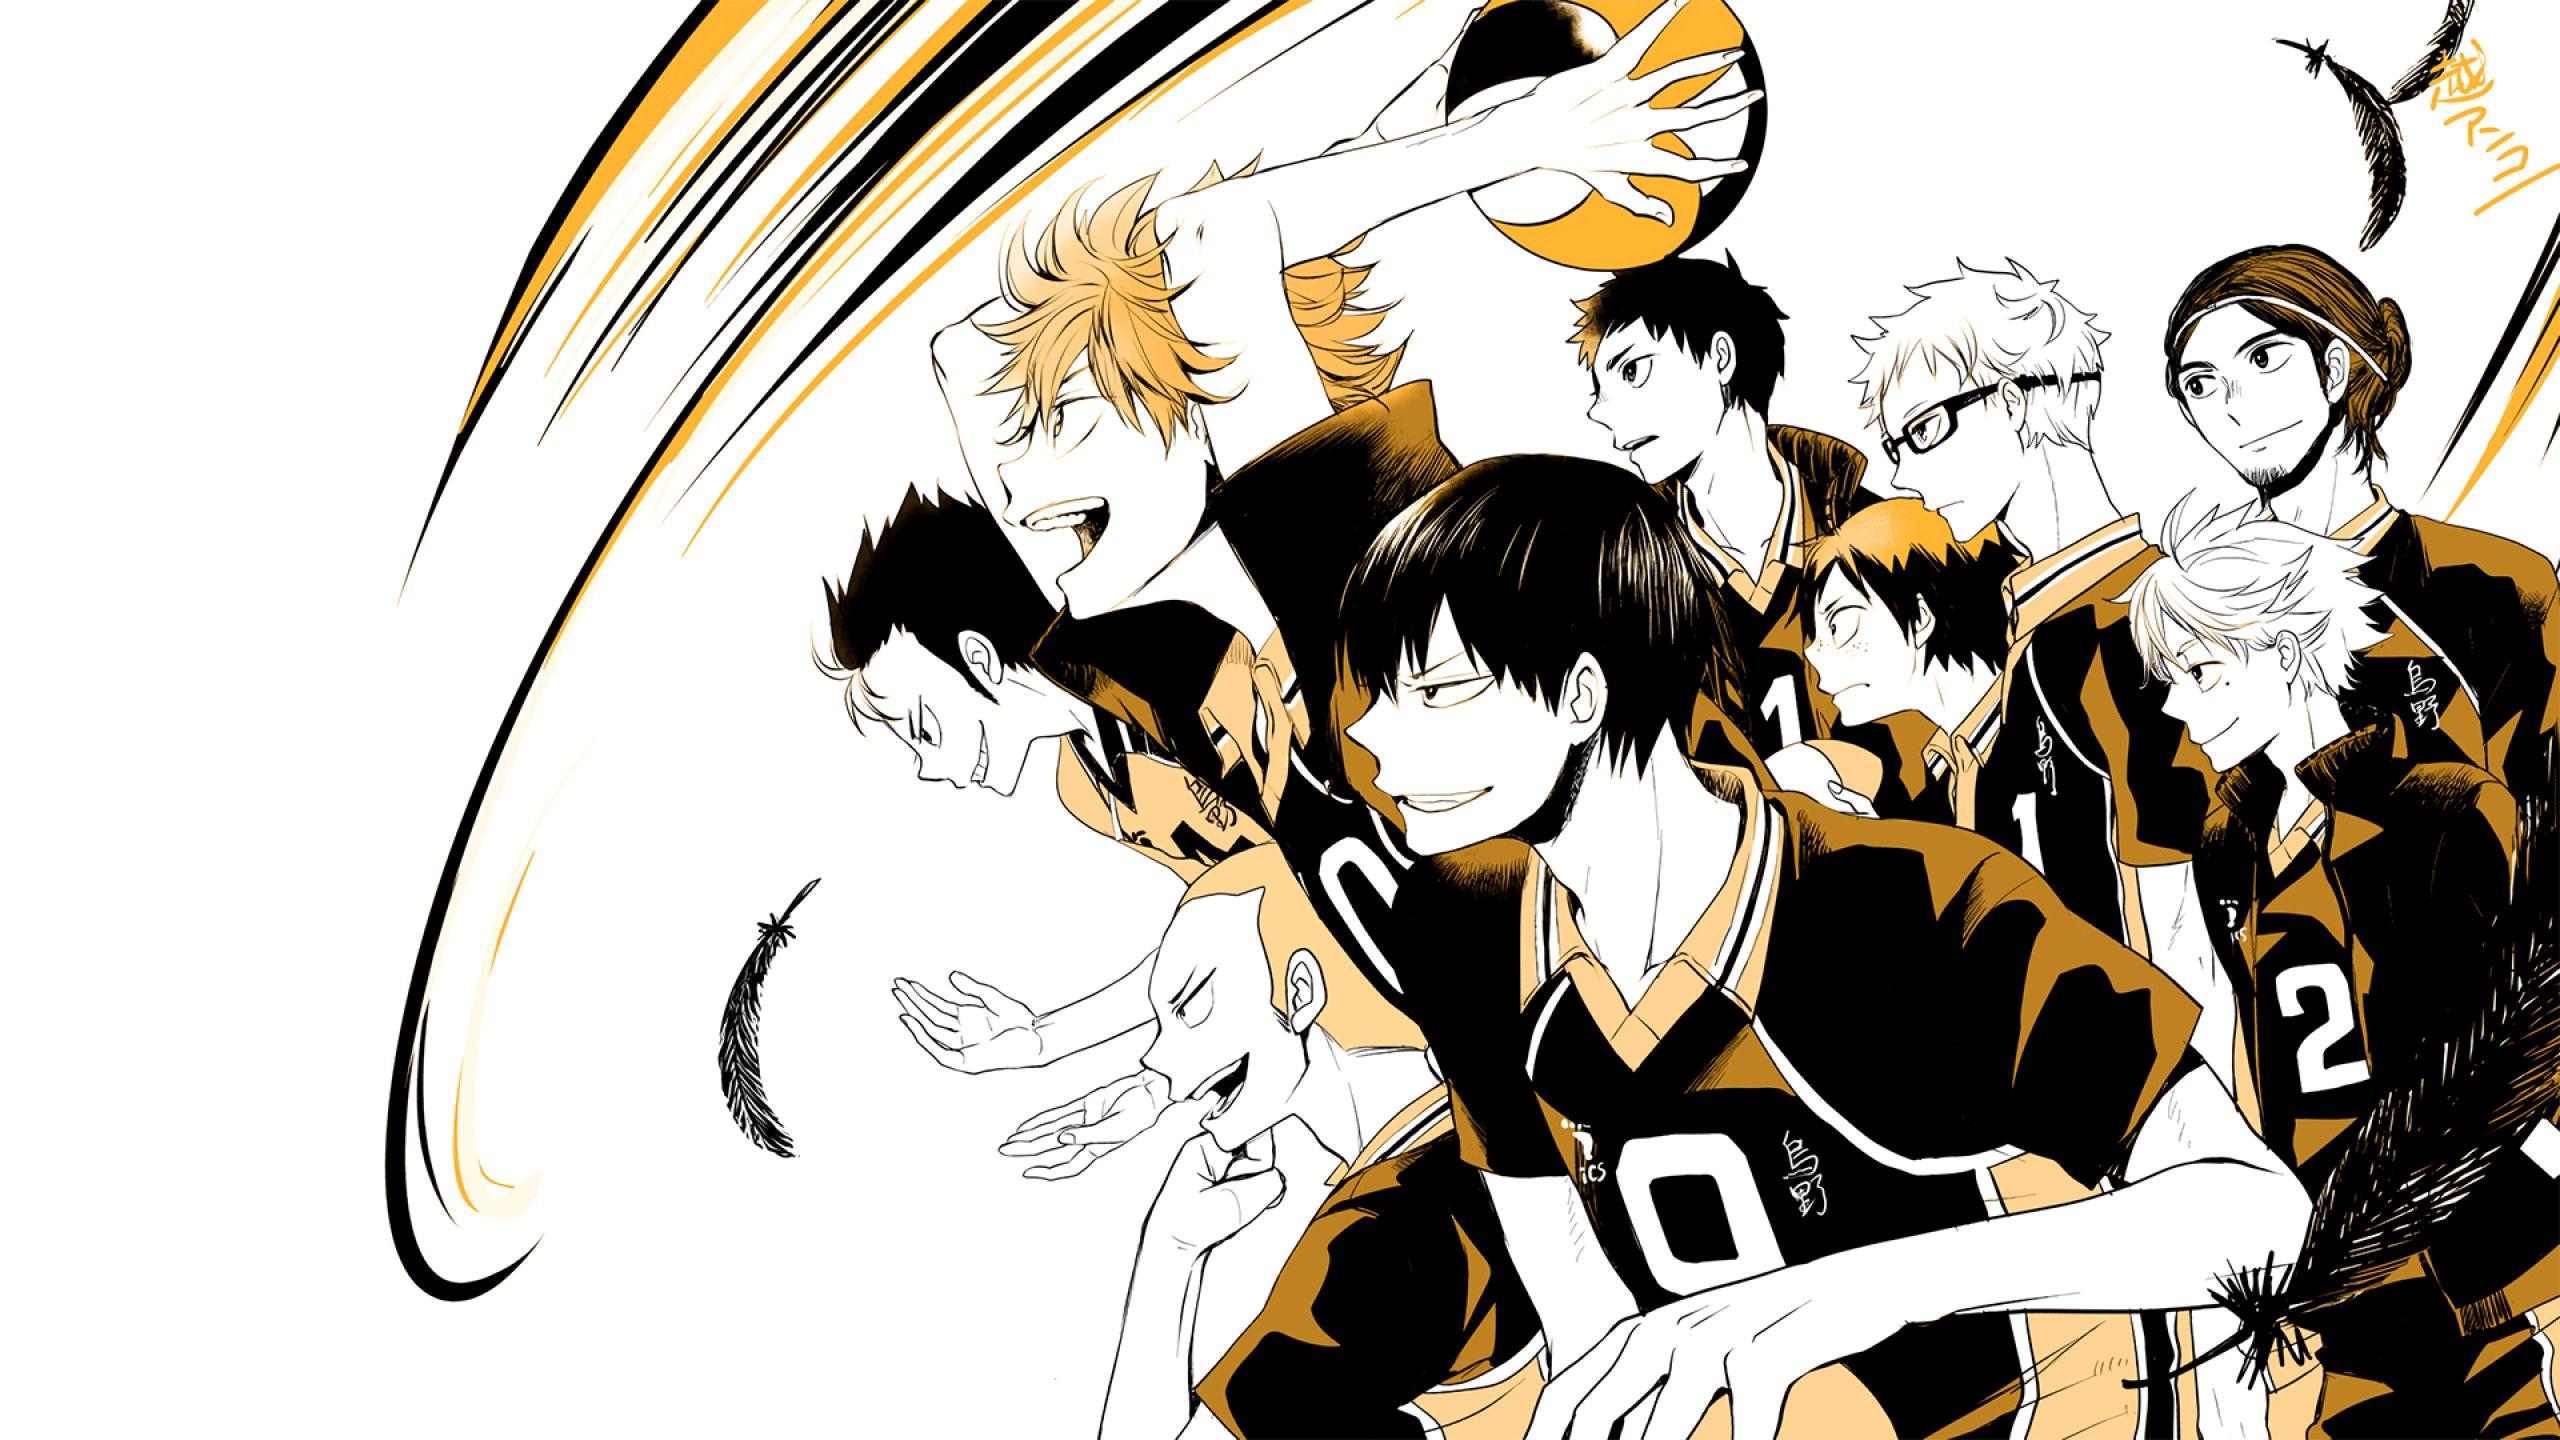 2560x1440 Haikyuu Wallpaper Anime Hd 2560x1440 Haikyuu Anime Haikyuu Wallpaper Anime Wallpaper